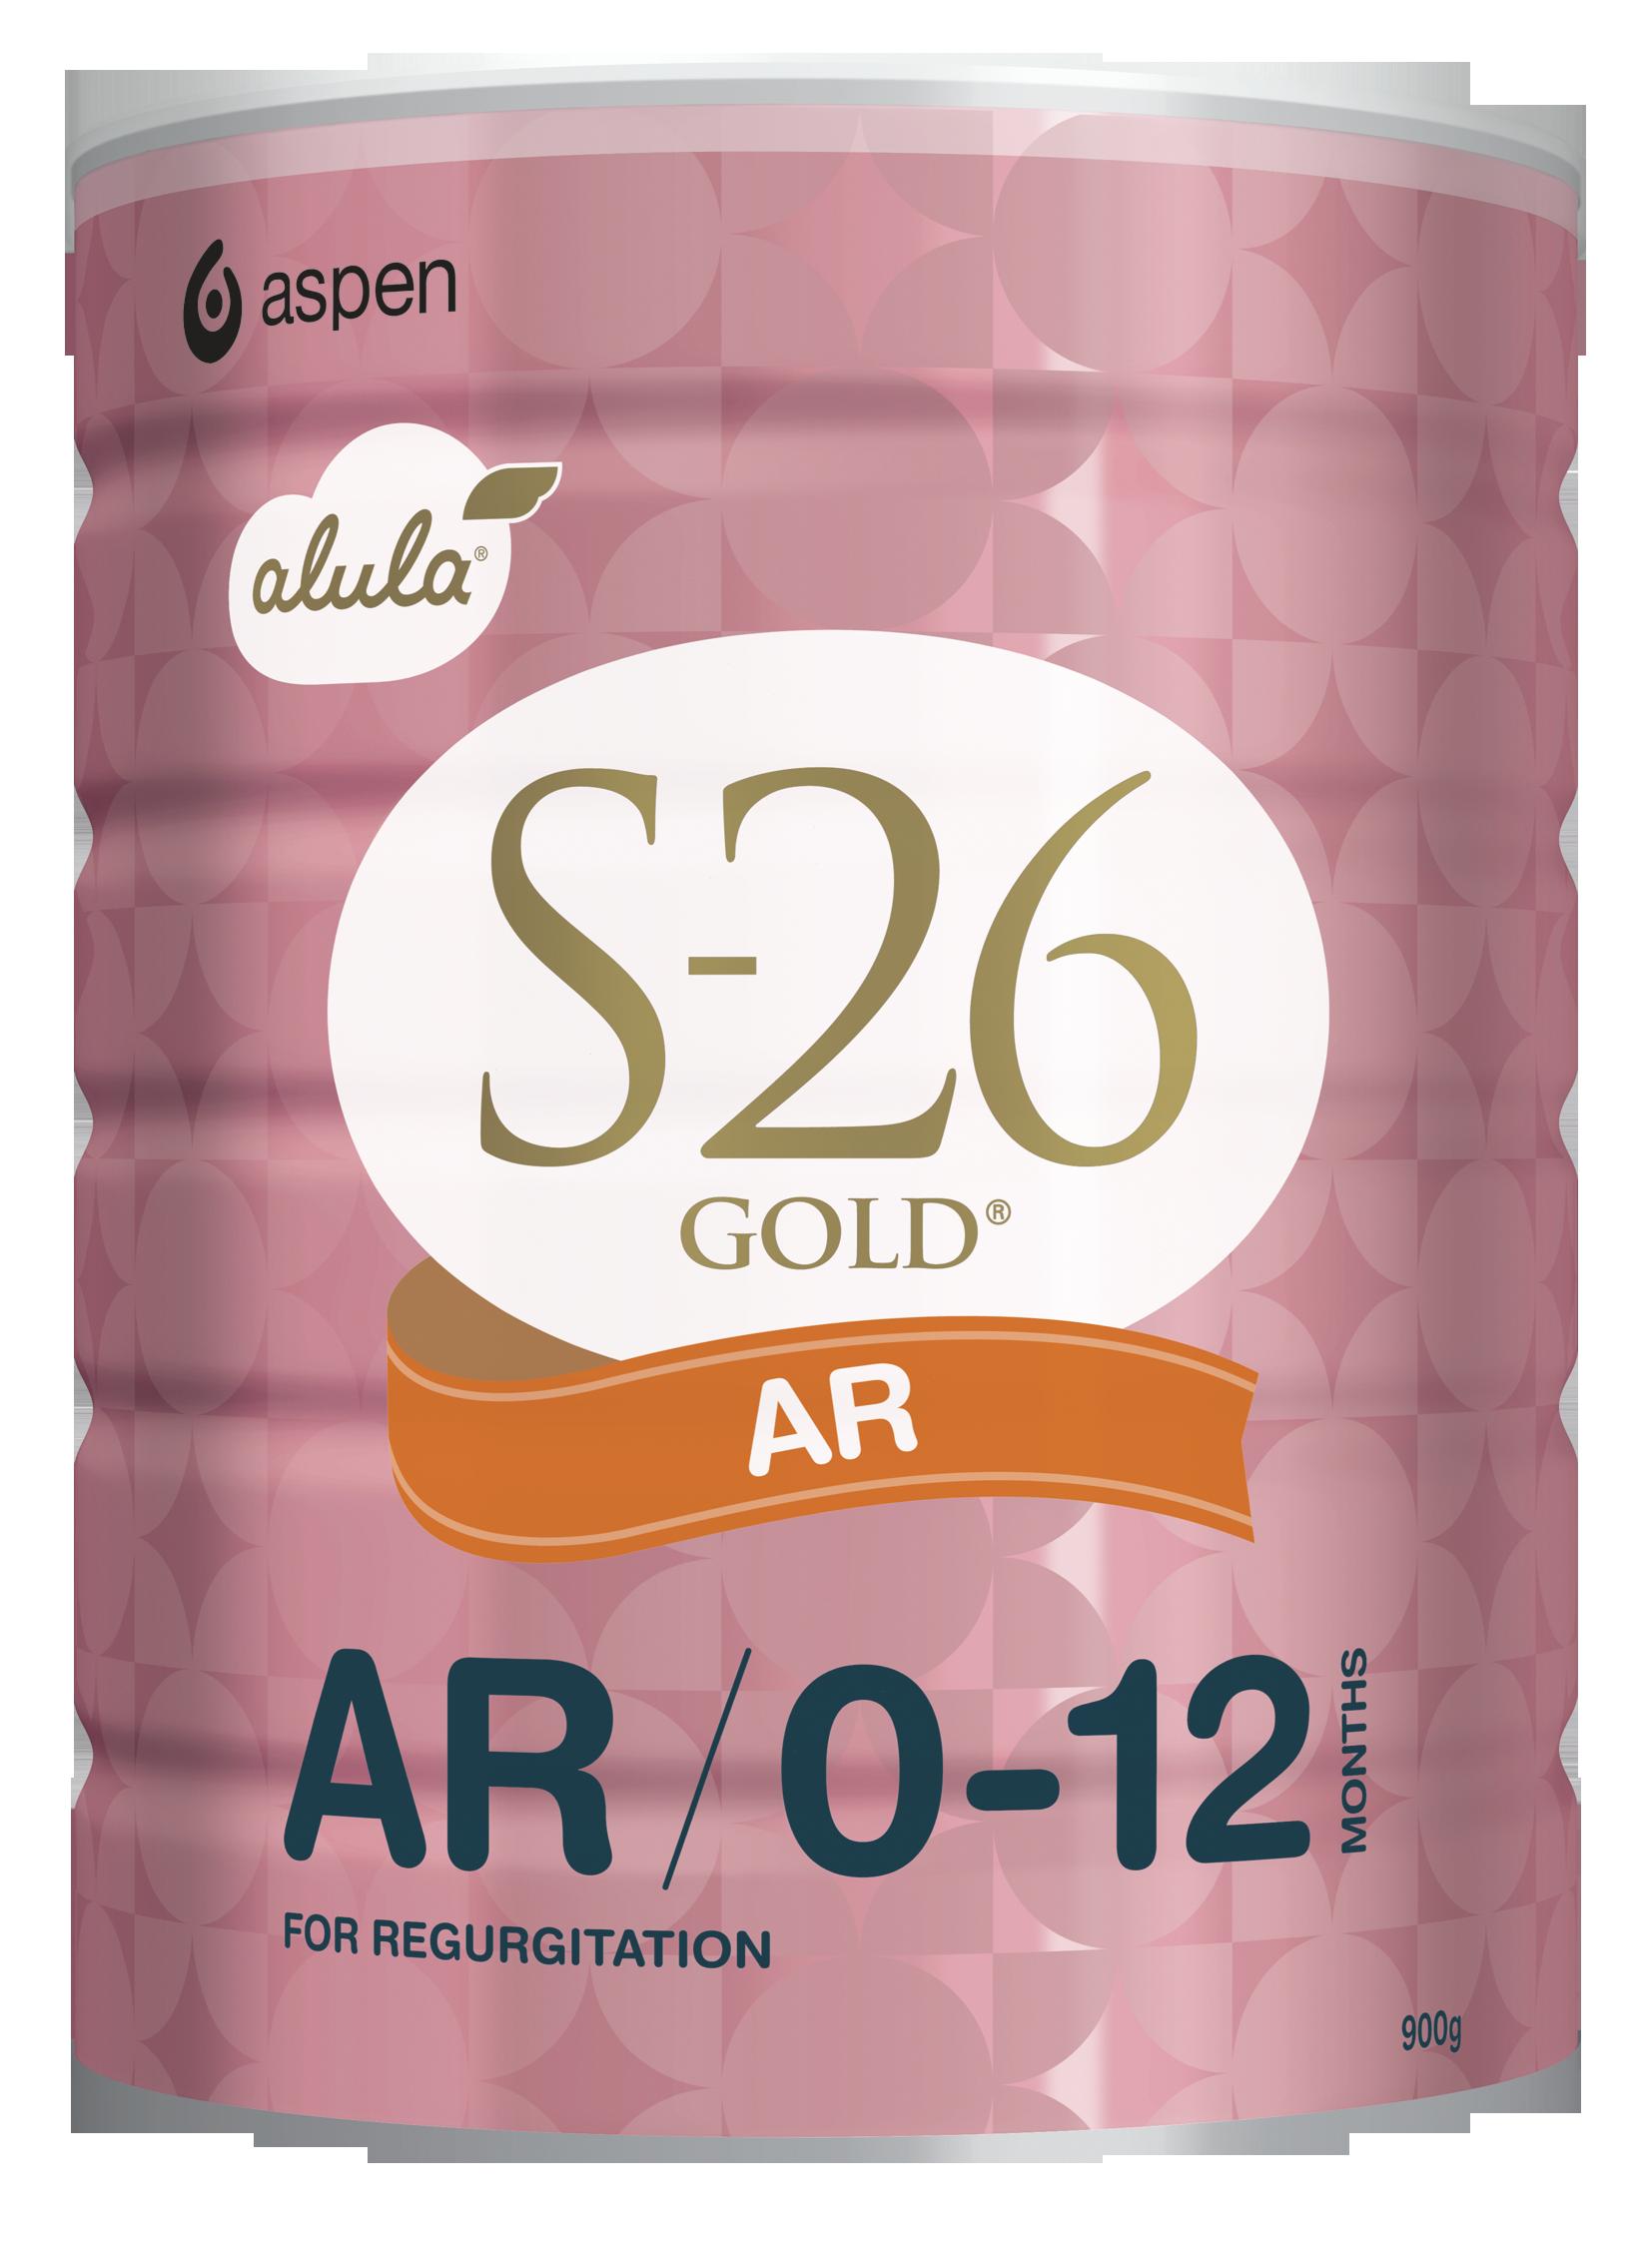 s26 gold ar reviews